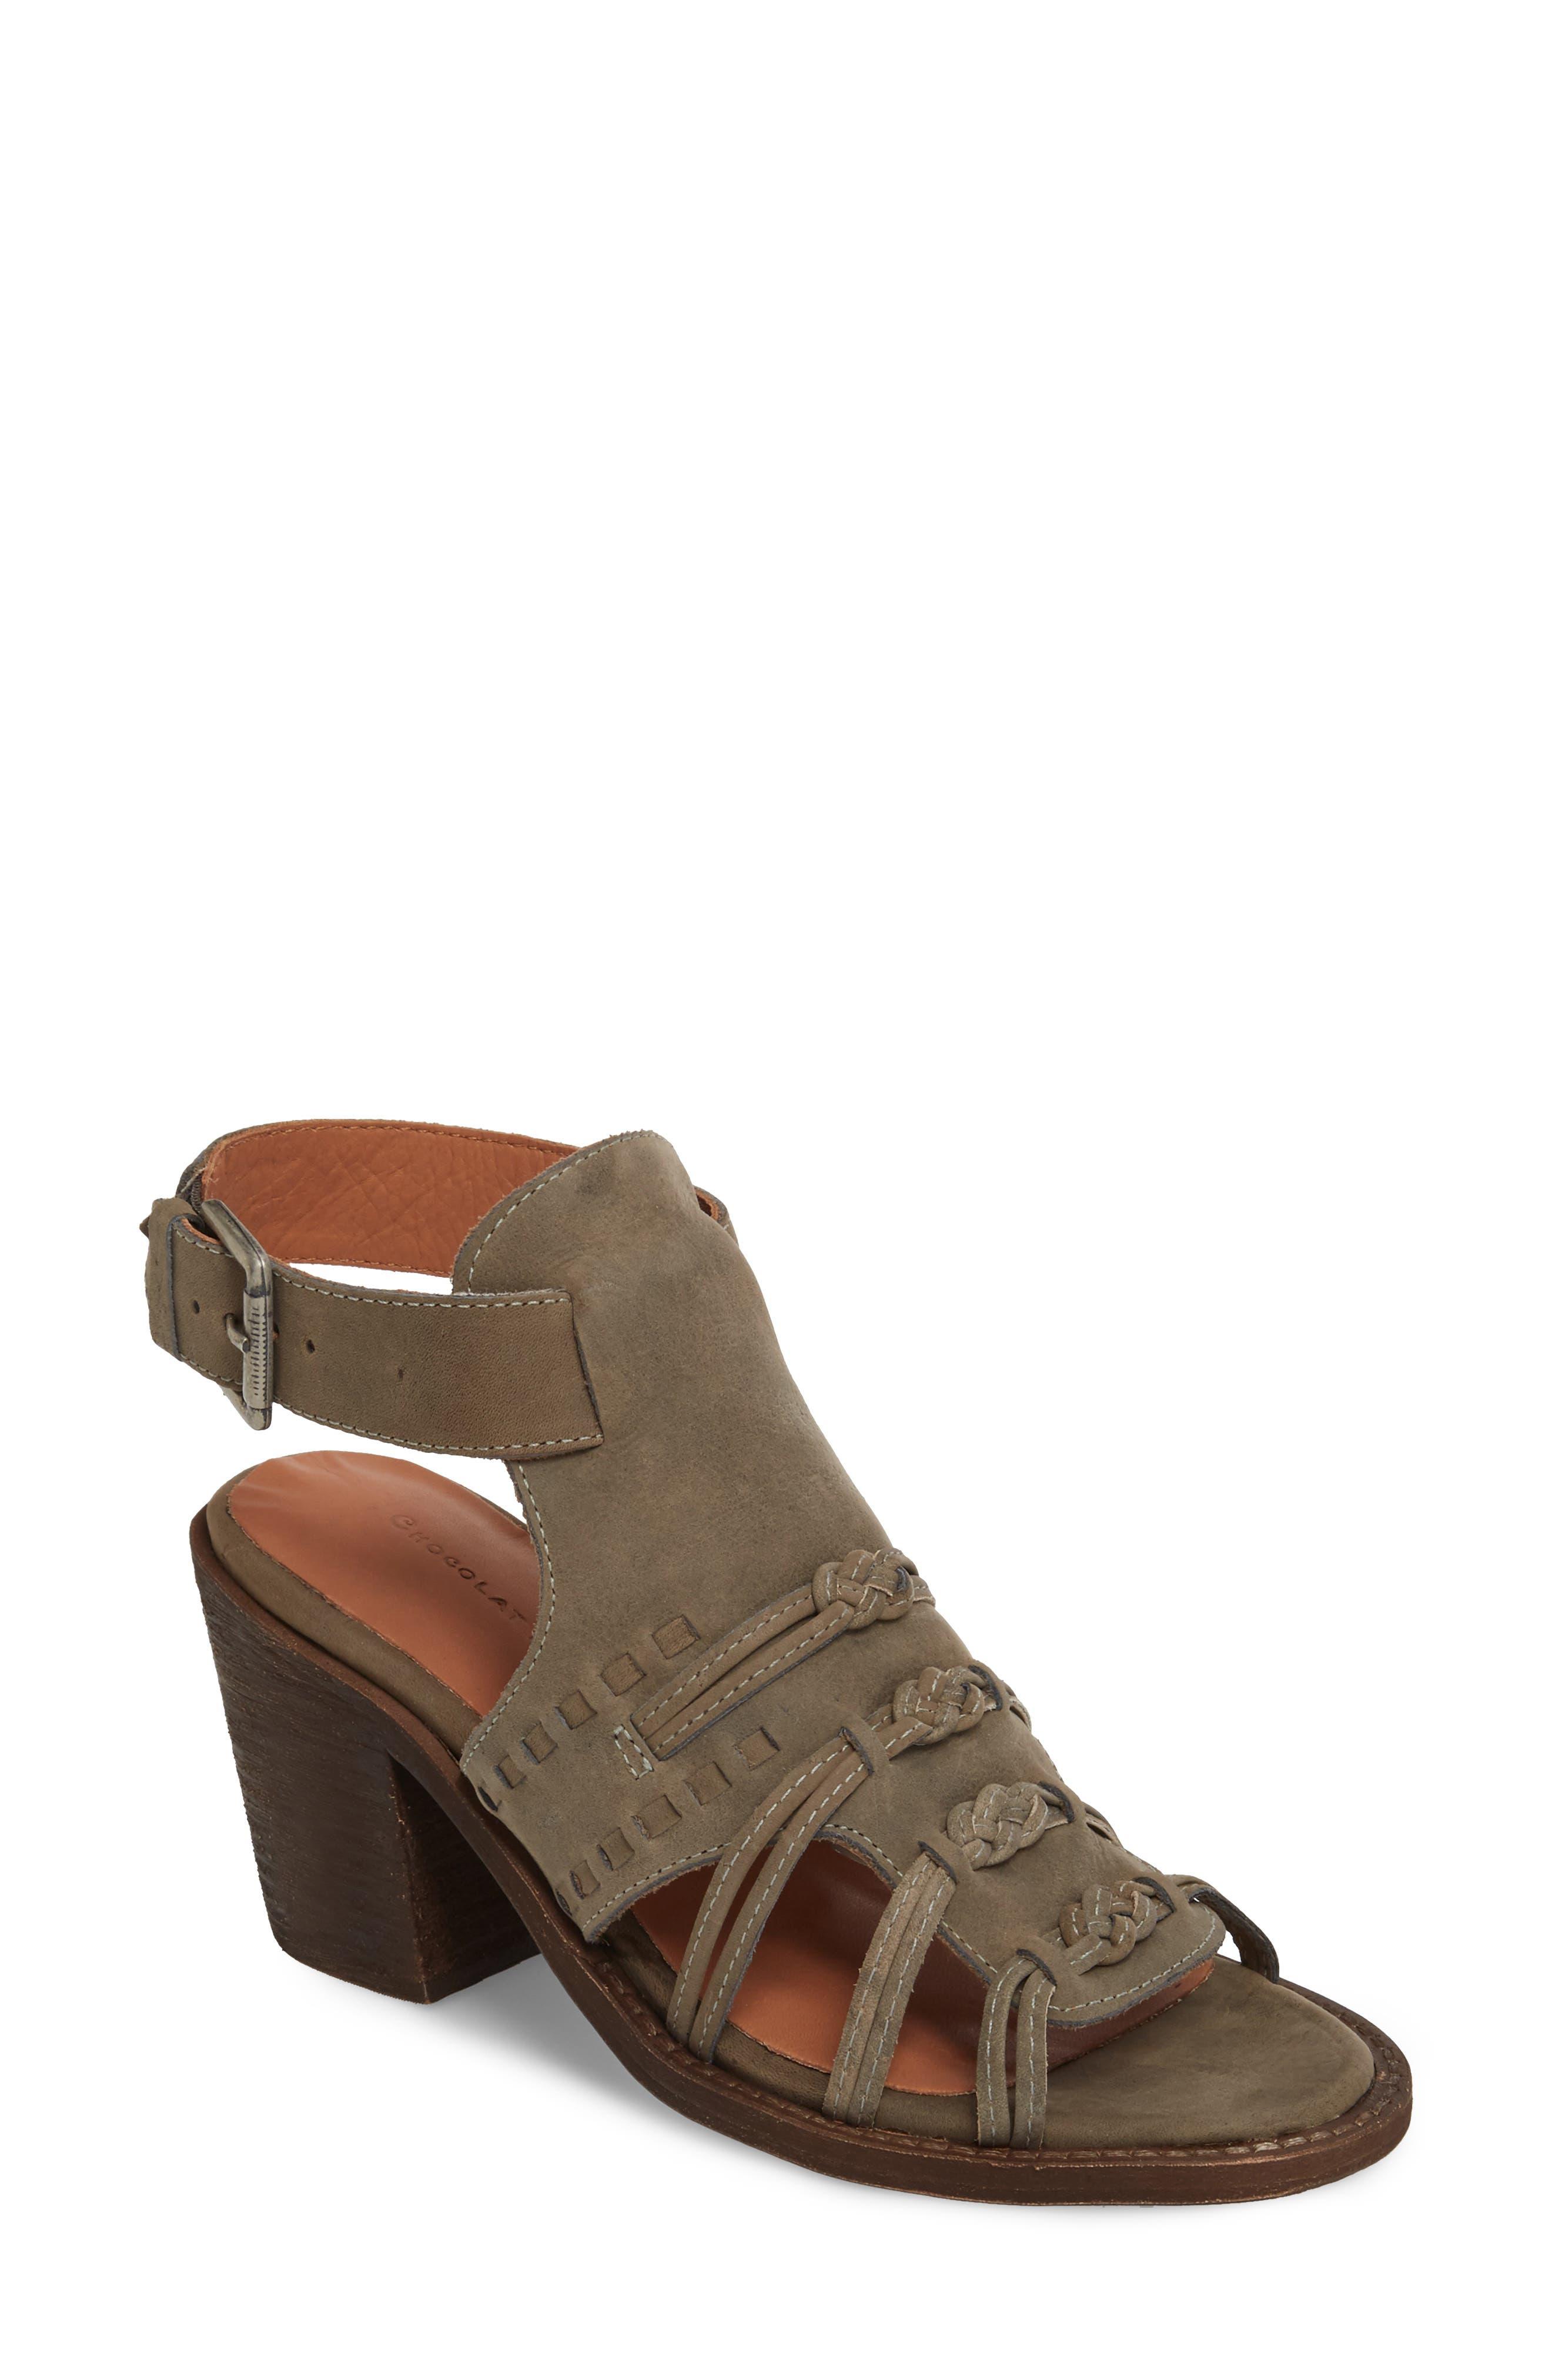 Volcano Sandal,                         Main,                         color,